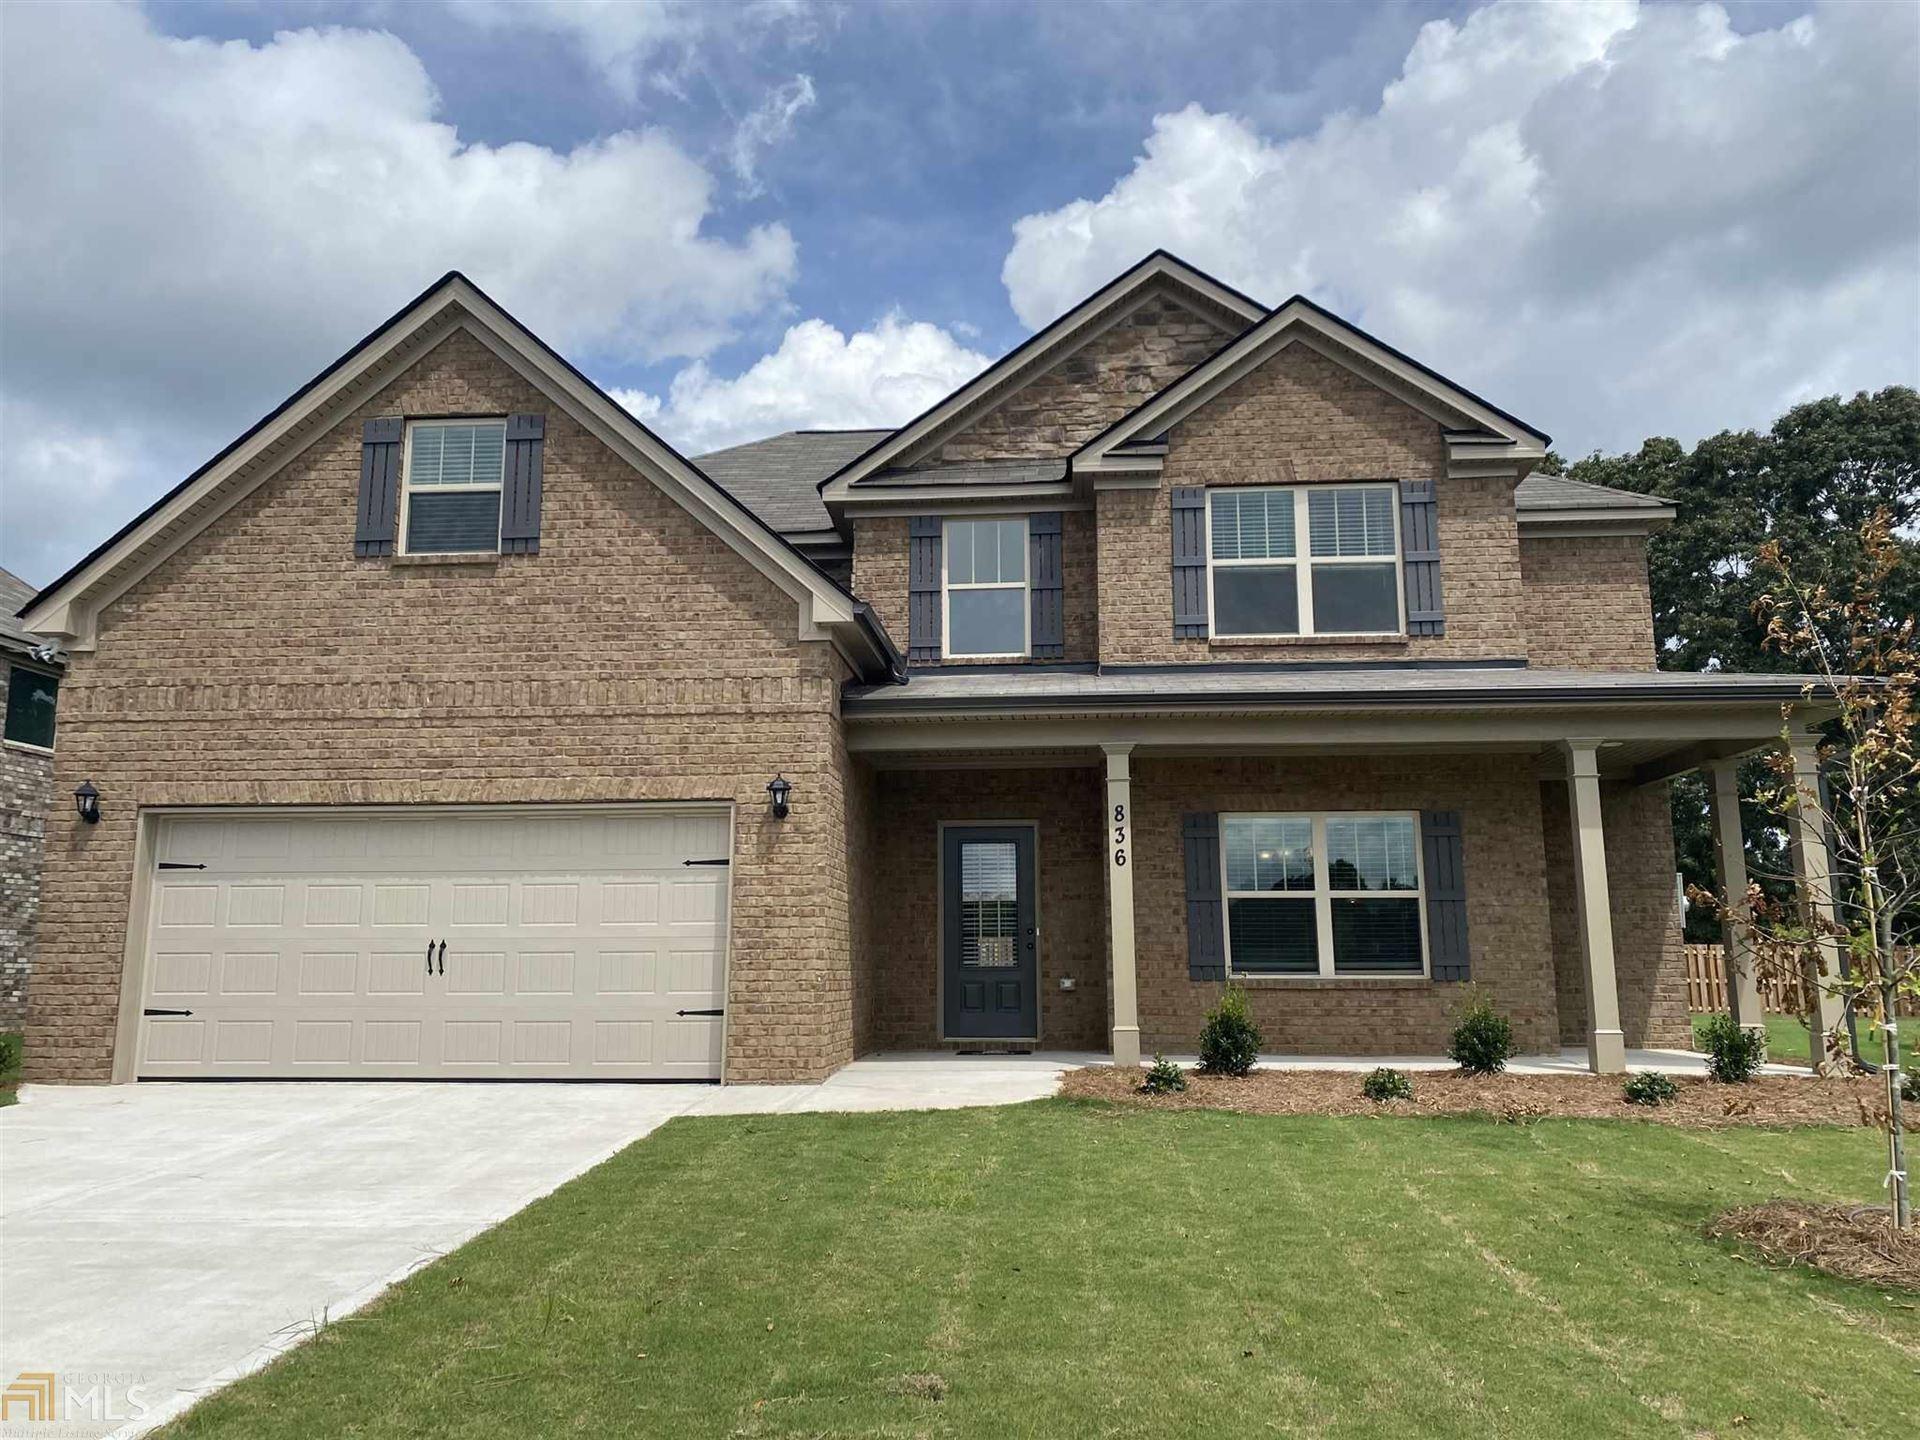 11206 Promise Pl, Hampton, GA 30228 - MLS#: 8884397